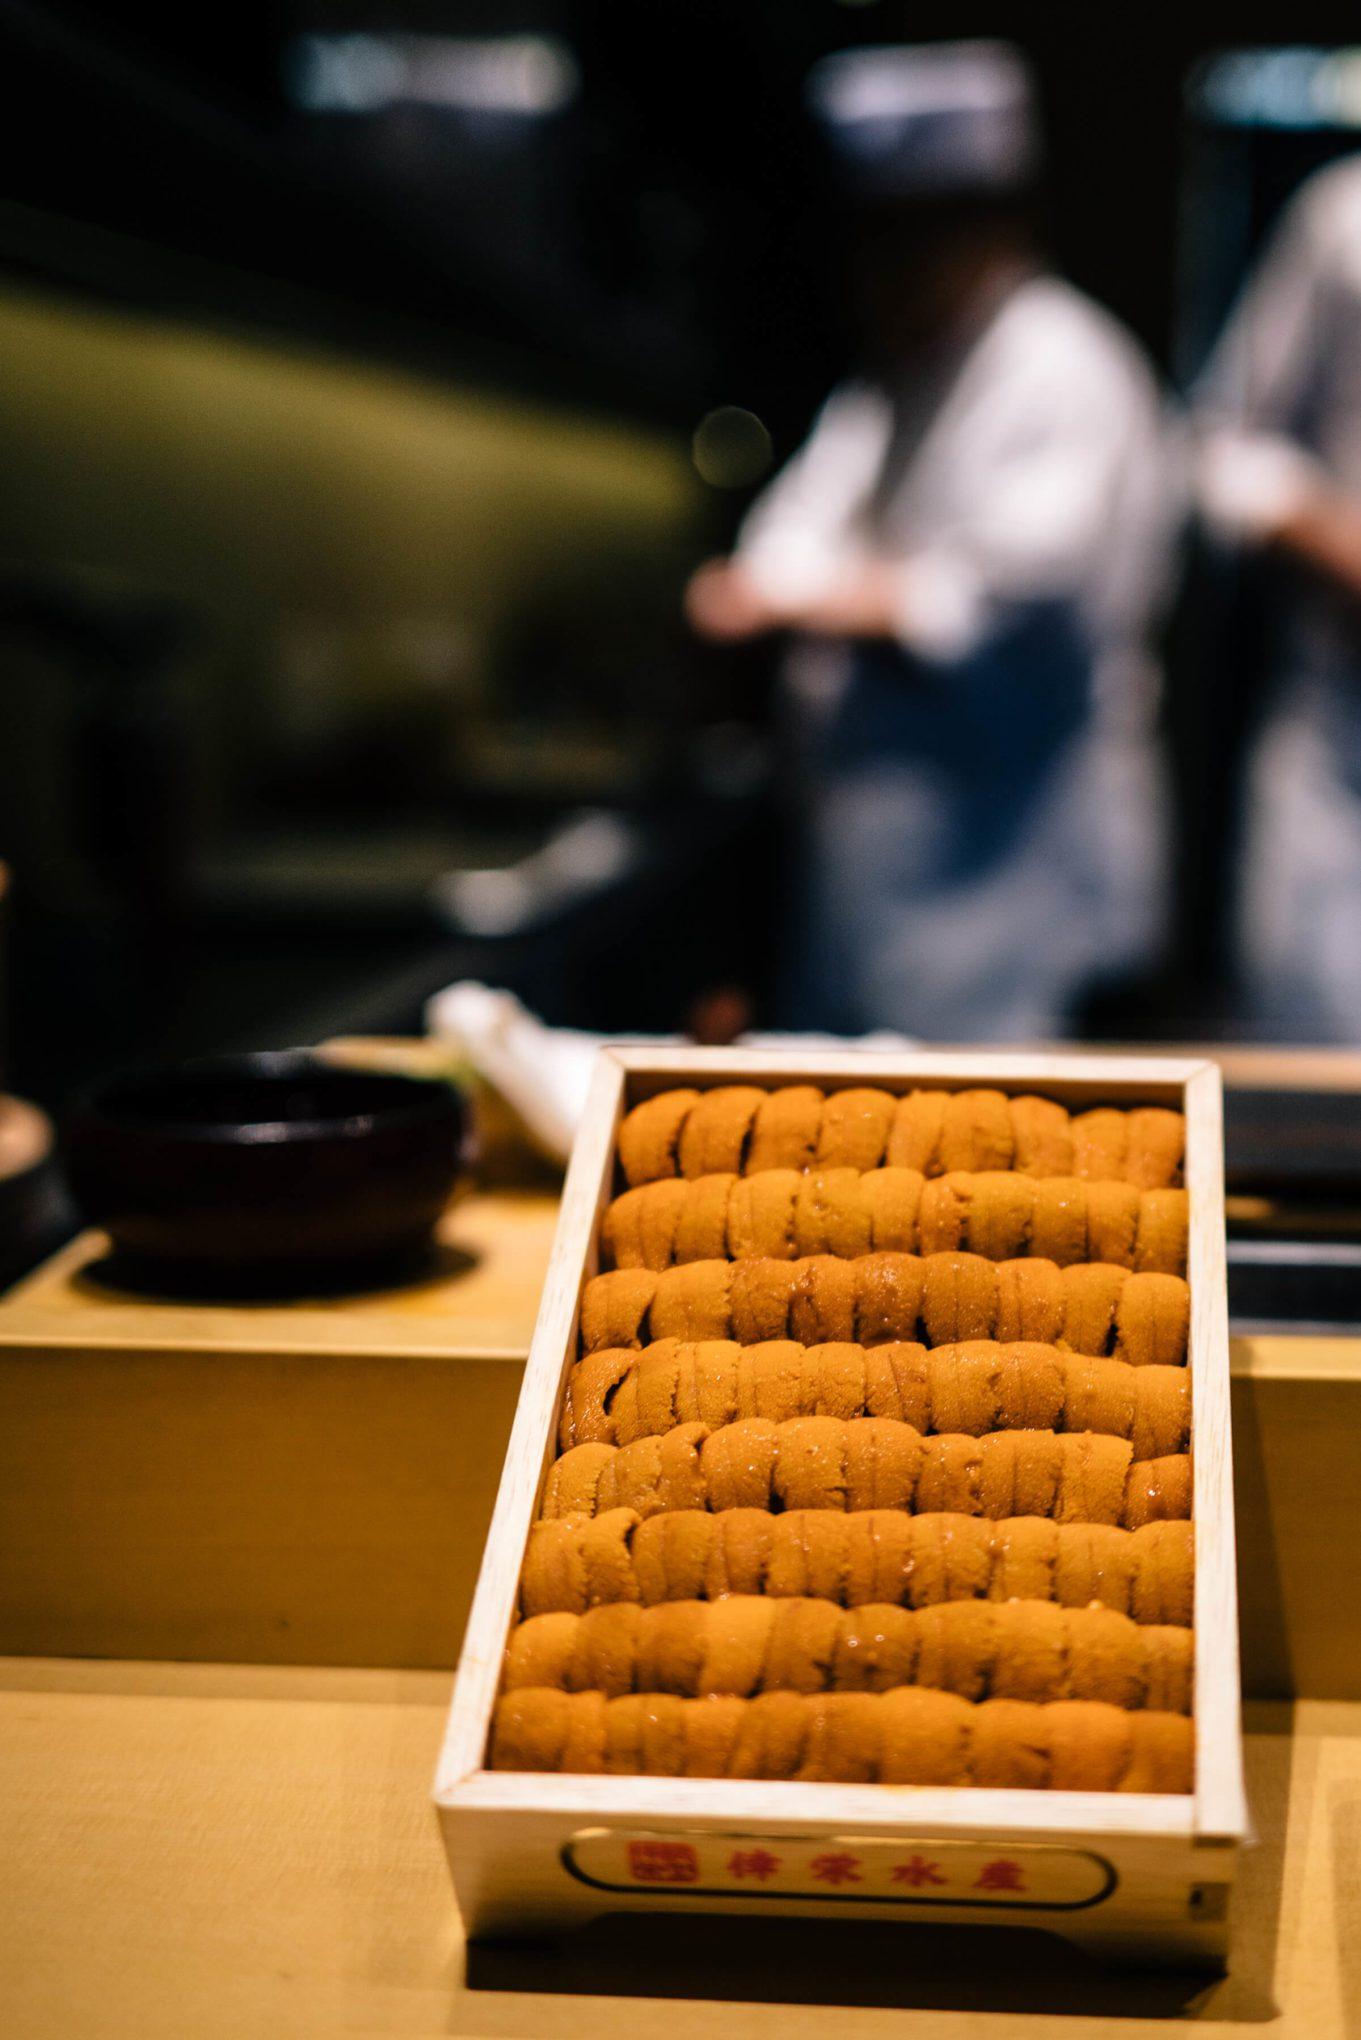 Tray of uni from Japan at San Francisco's Omakase restaurant, The Taste Edit